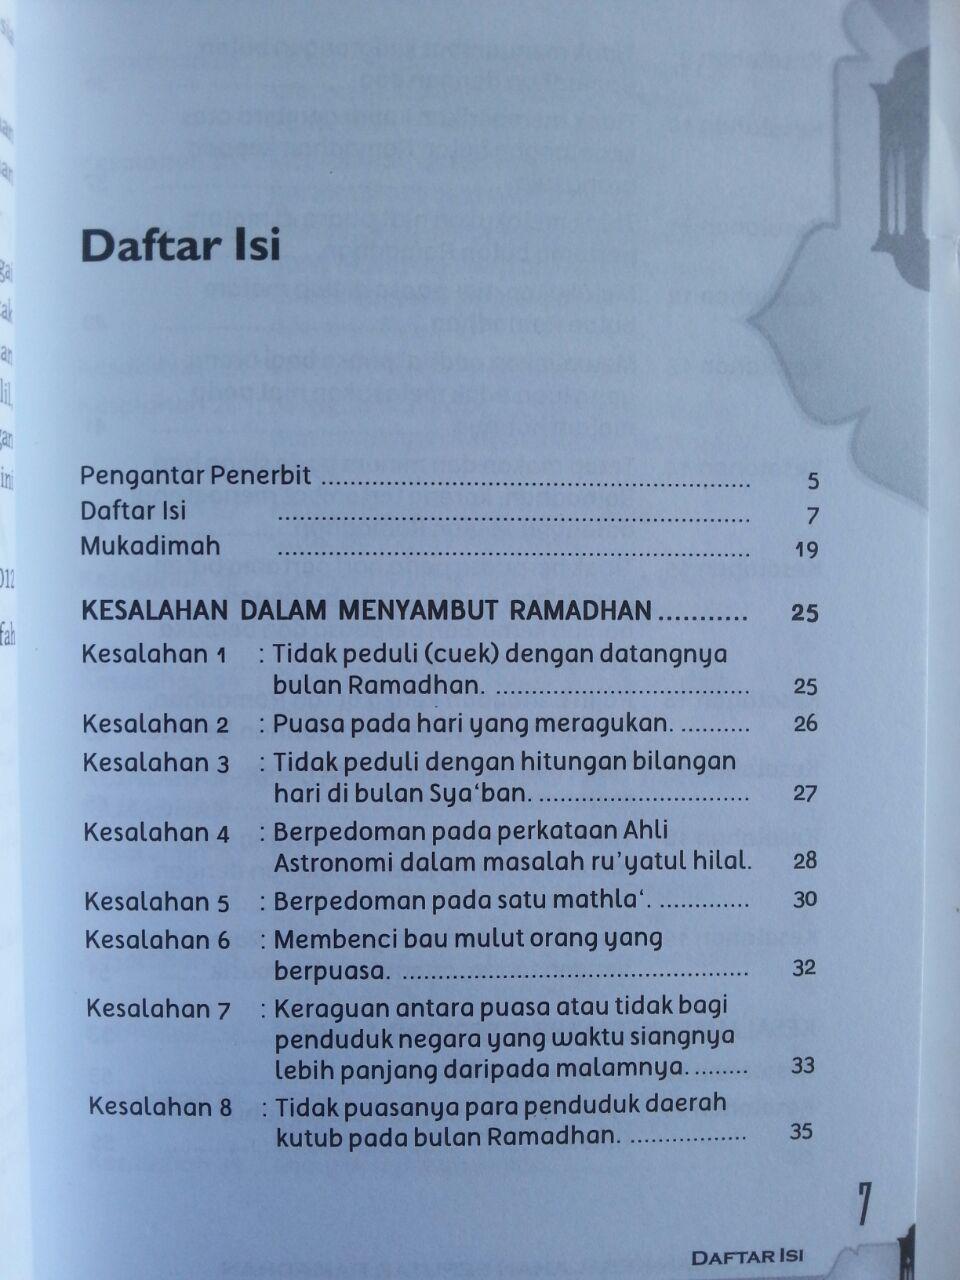 Buku Kesalahan-Kesalahan Seputar Ramadhan 170 Koreksi isi 2